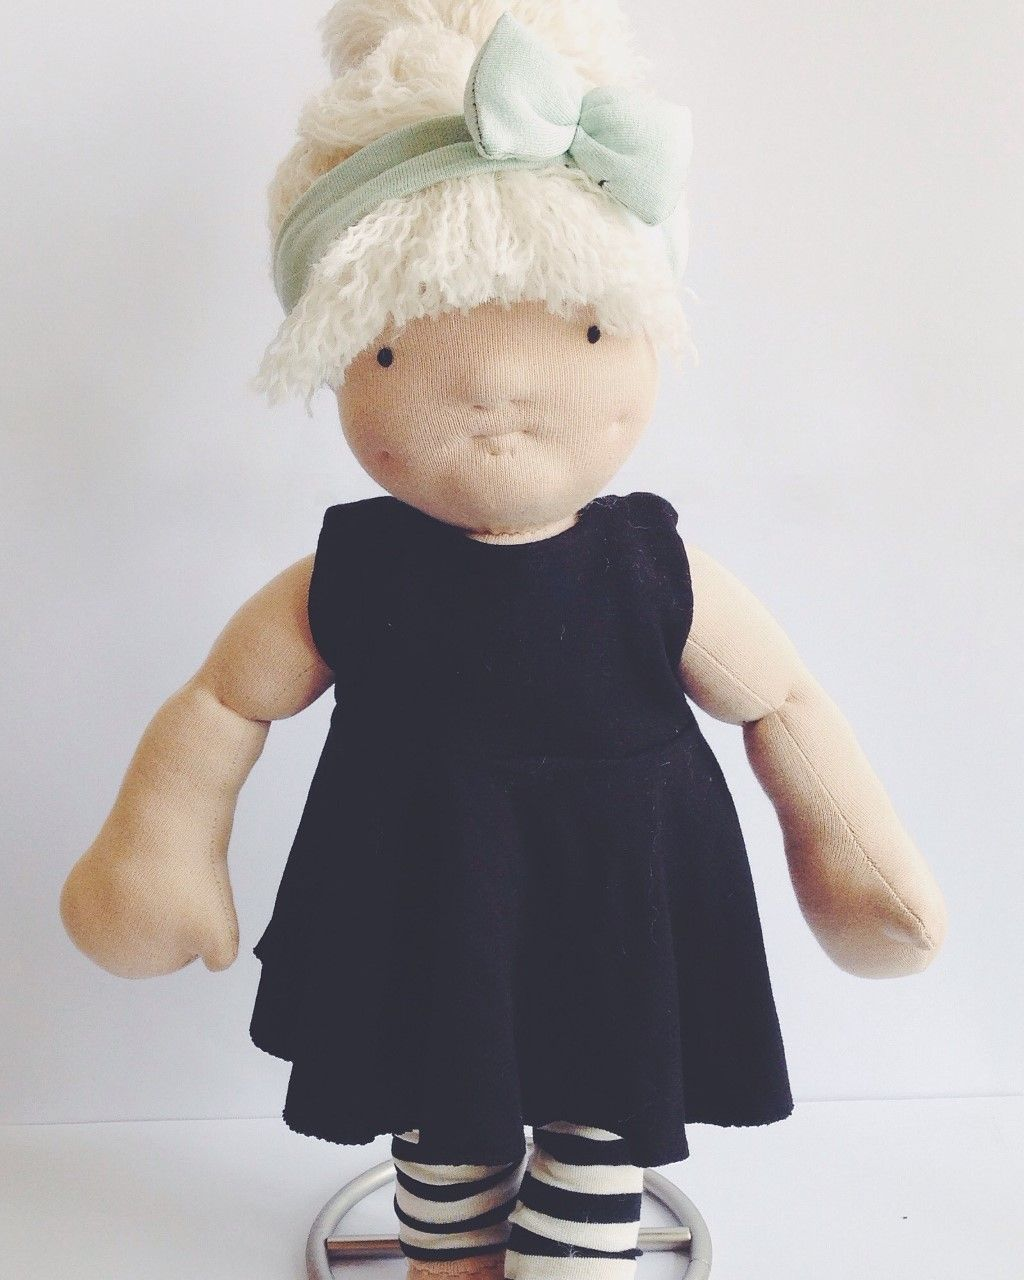 Handmade waldorf inspired doll by Kaisa&Me <3